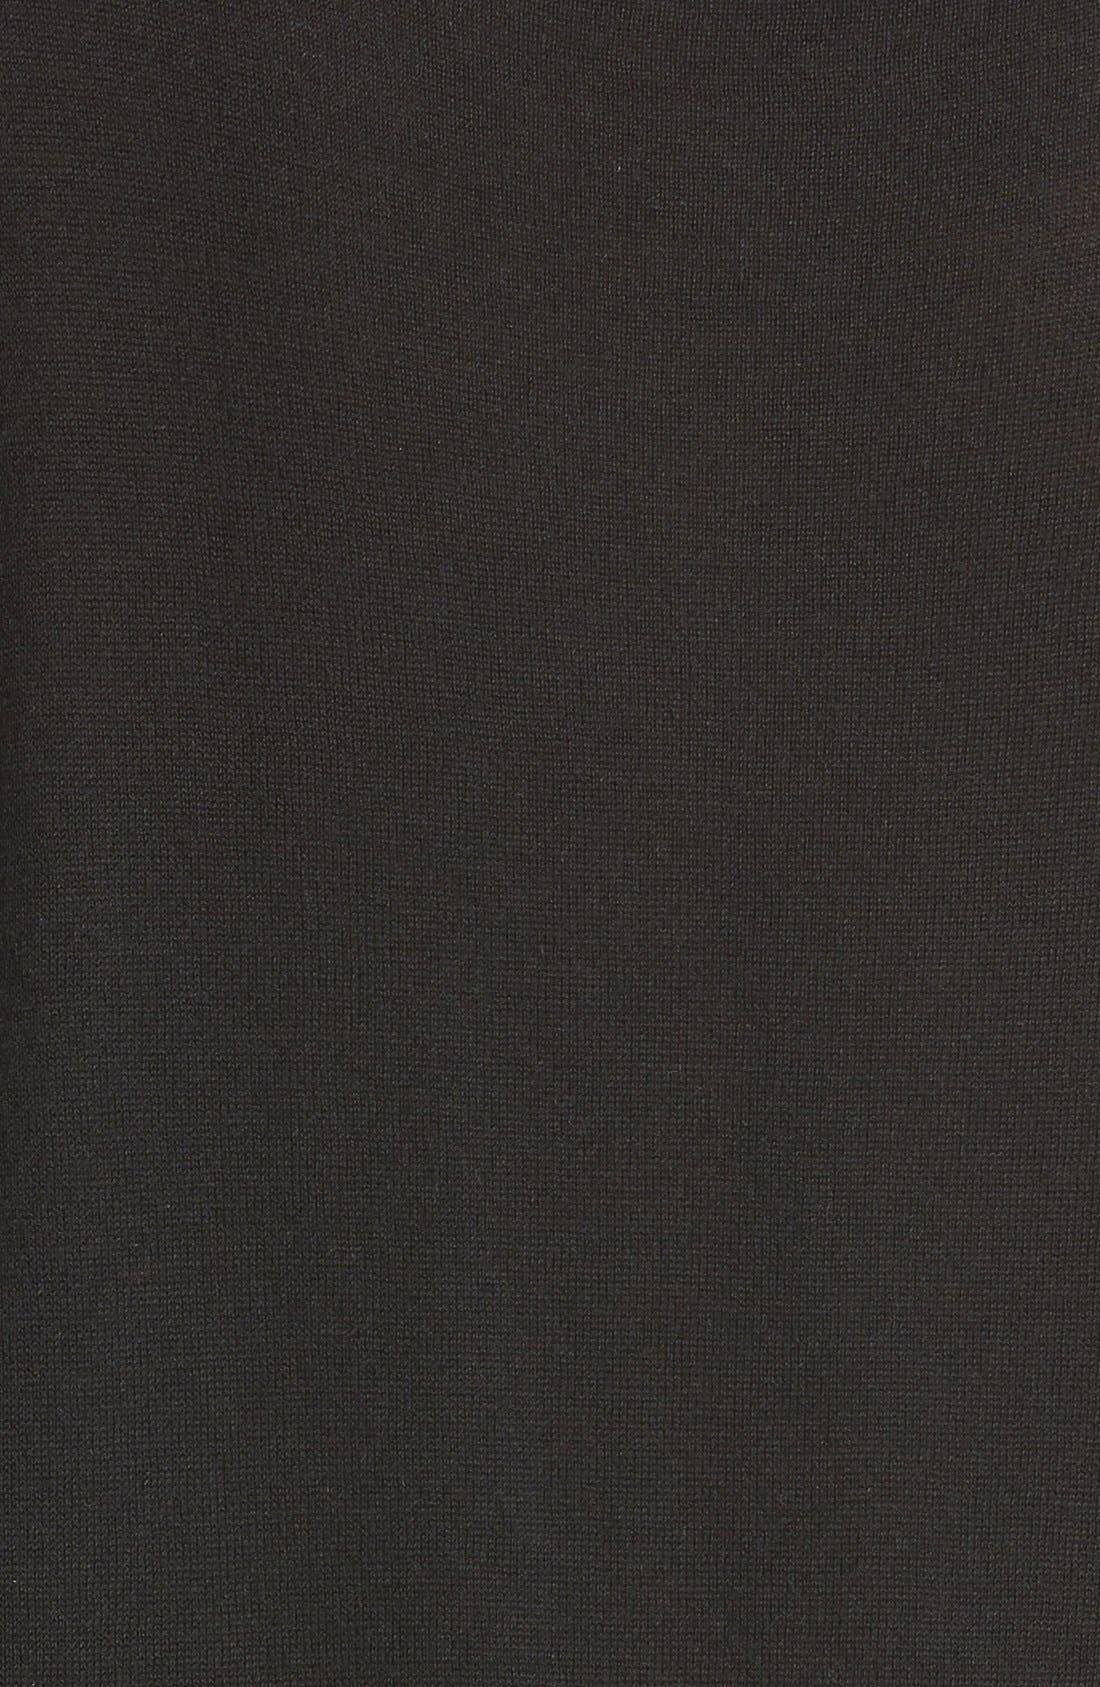 Alternate Image 5  - 10 Crosby Derek Lam Knit Silk & Cashmere Cold Shoulder Sweater